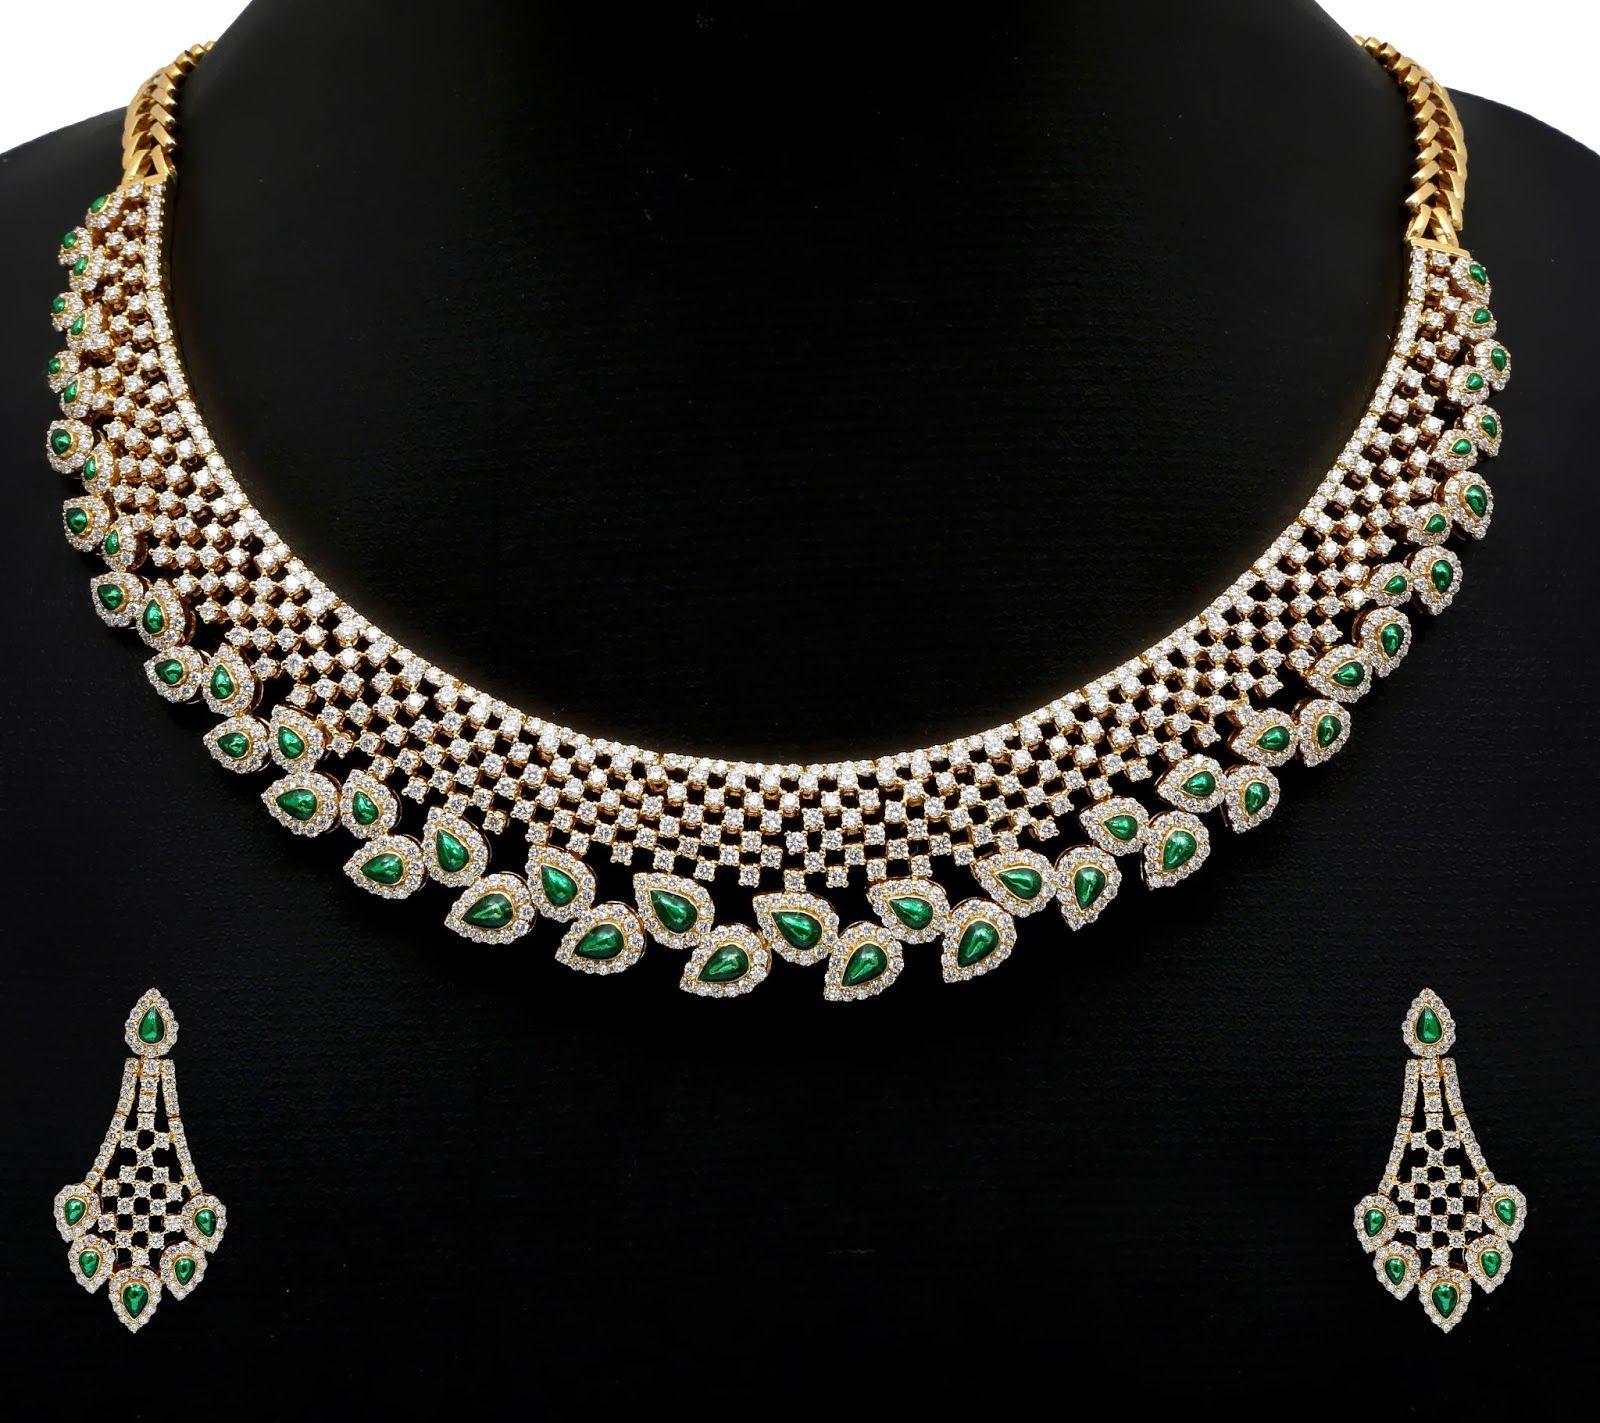 diaomnd+necklace.jpg (1600×1423) | Jewellery ...!!! | Pinterest ...